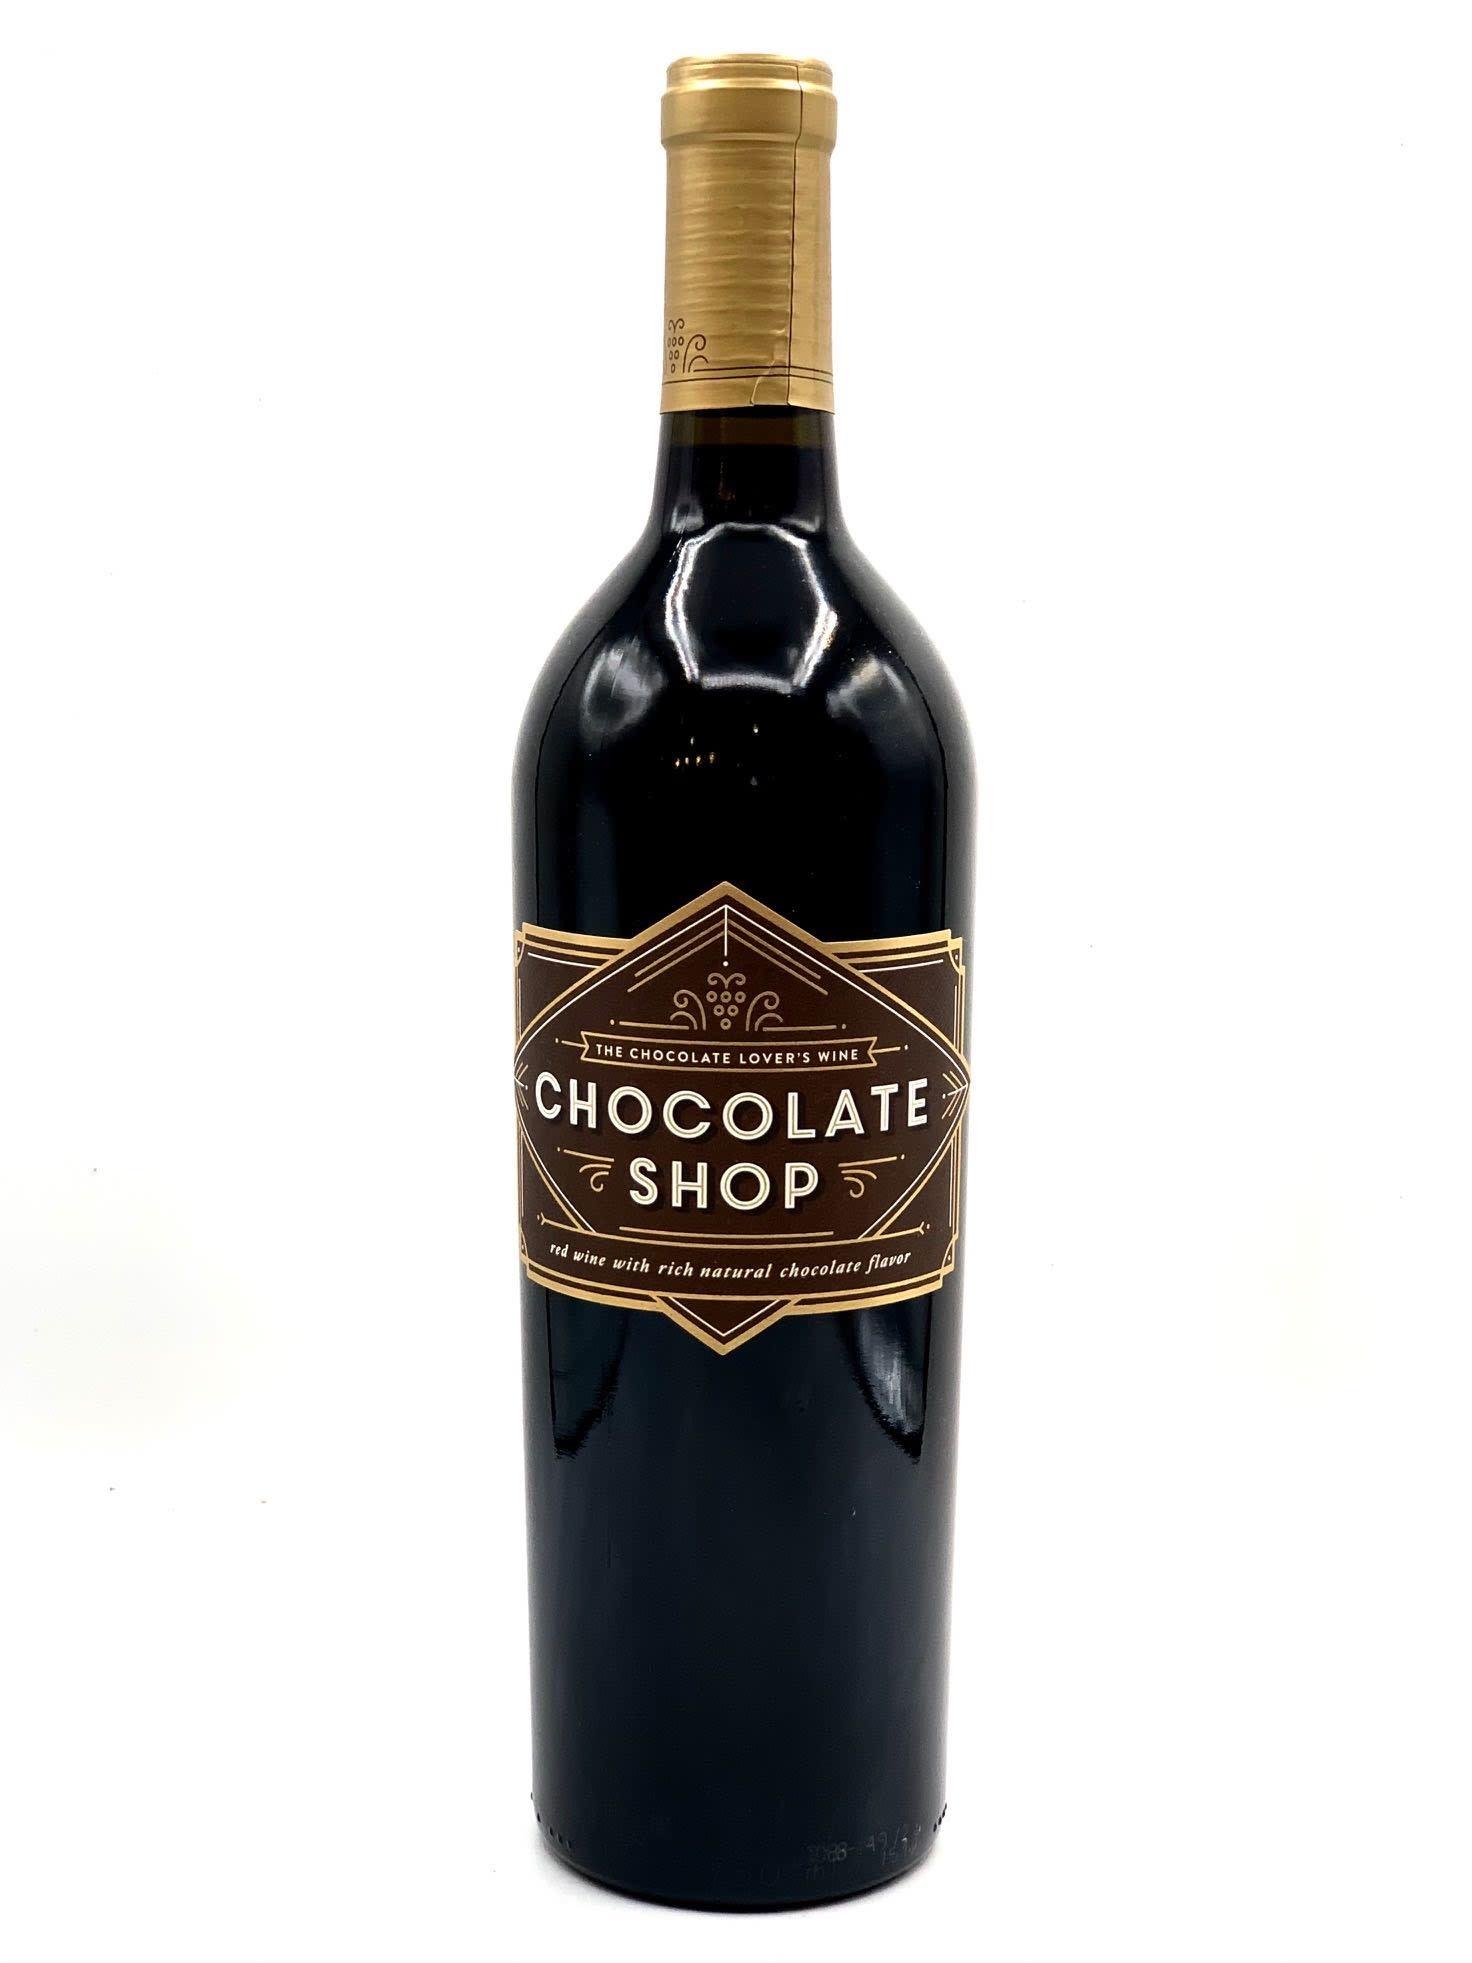 Columbia Valley Dark Chocolate Infused Red Wine NV Chocolate Shop 750ml